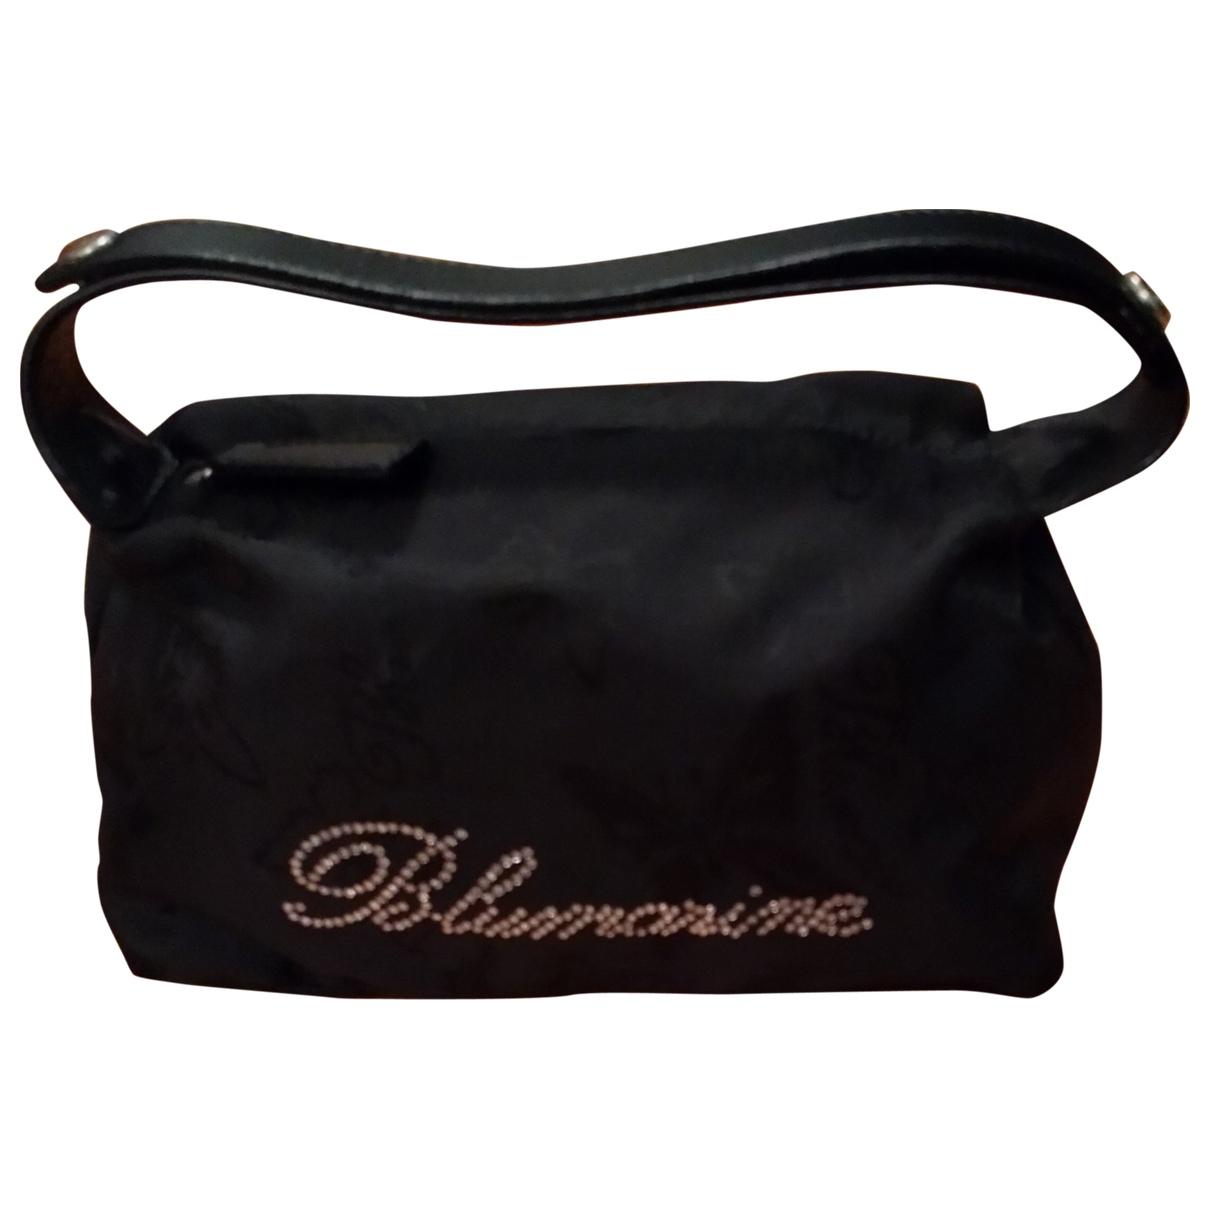 Blumarine N Black Cloth handbag for Women N